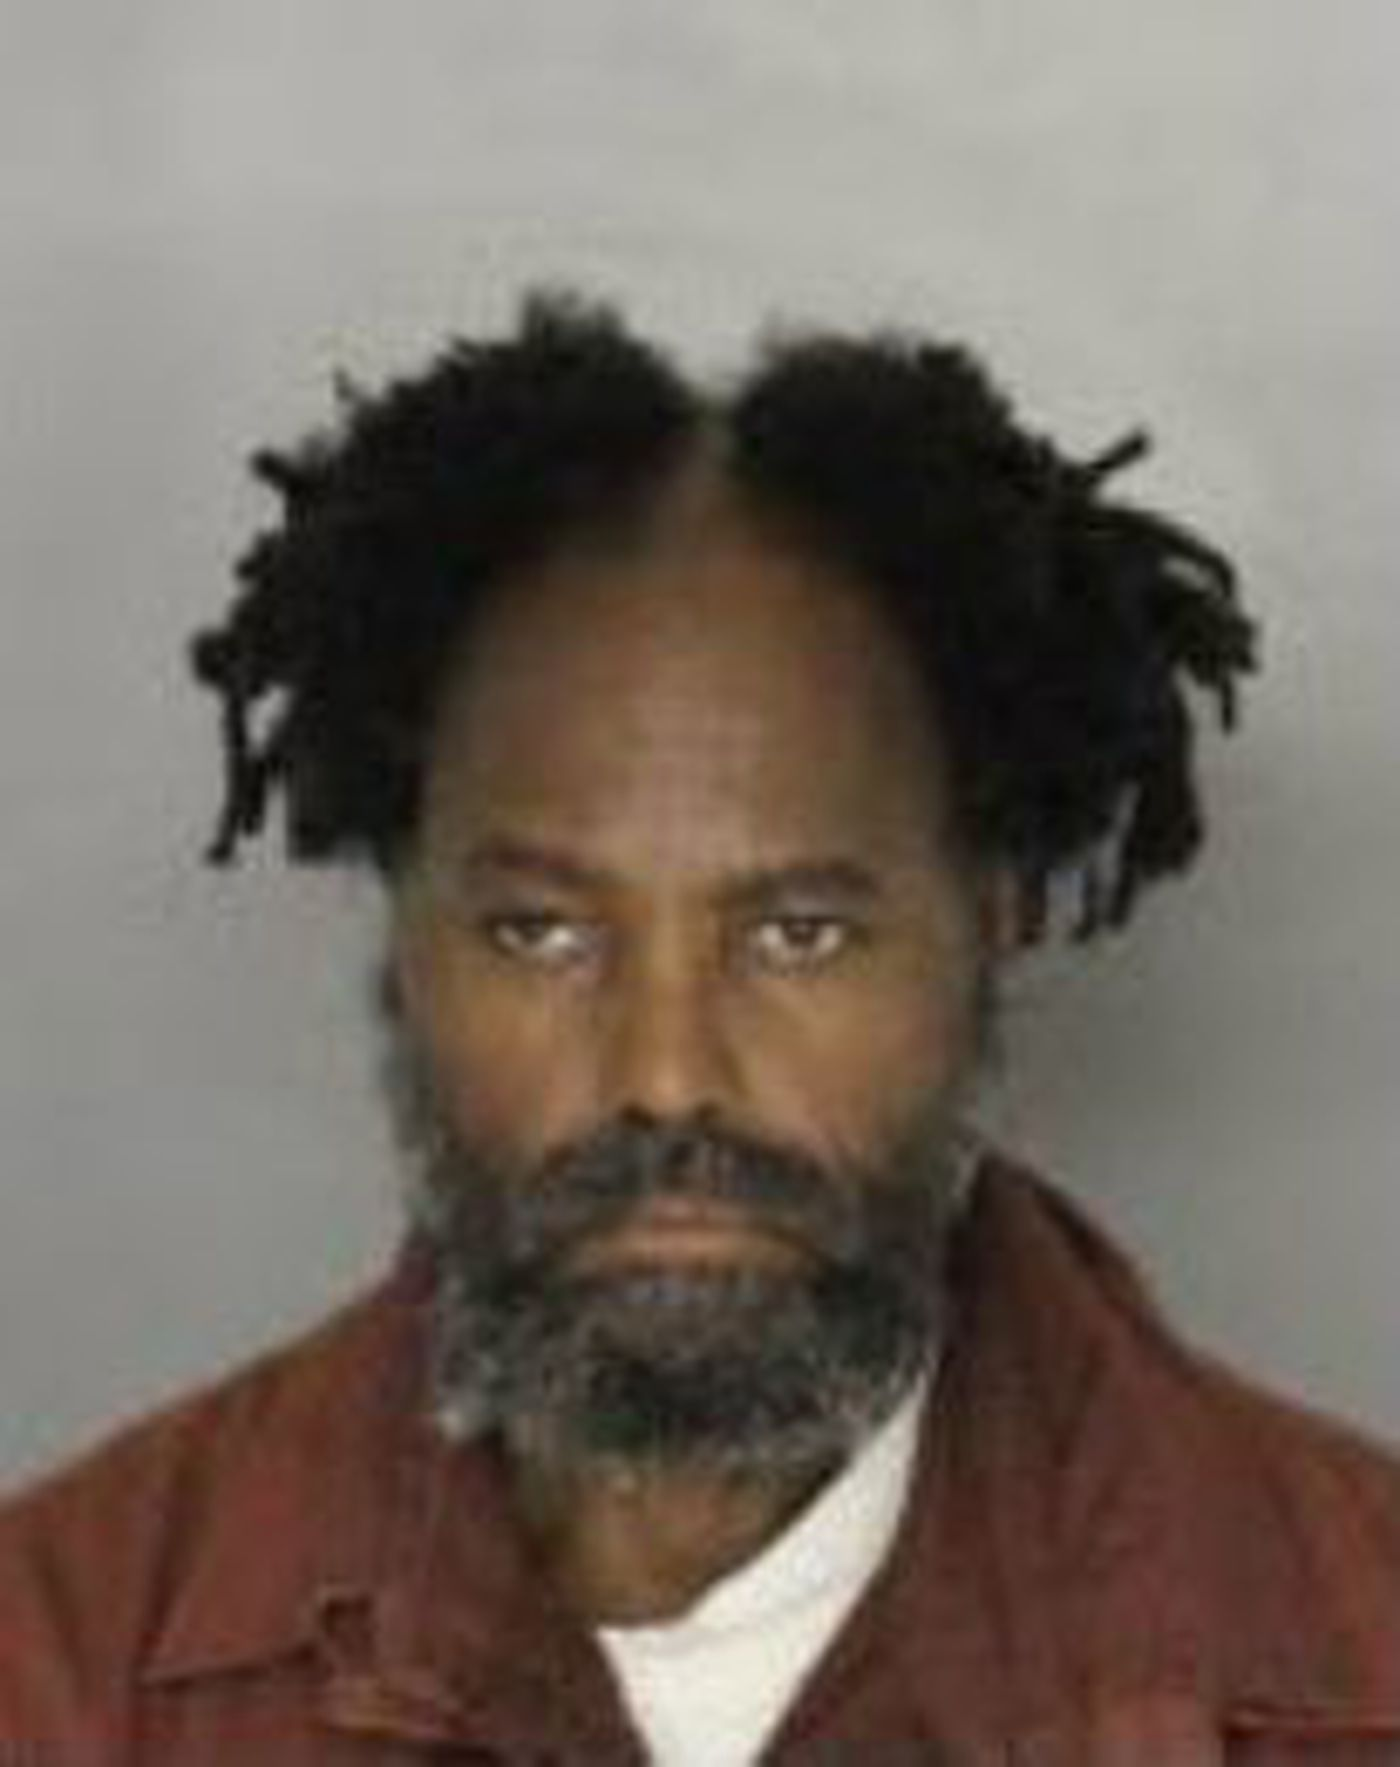 Mumia Abu-Jamal in an October 2017 state prison photo; https://www.inquirer.com/news/mumia-abu-jamal-maureen-faulkner-pennsylvania-supreme-court-conflict-larry-krasner-20200224.html